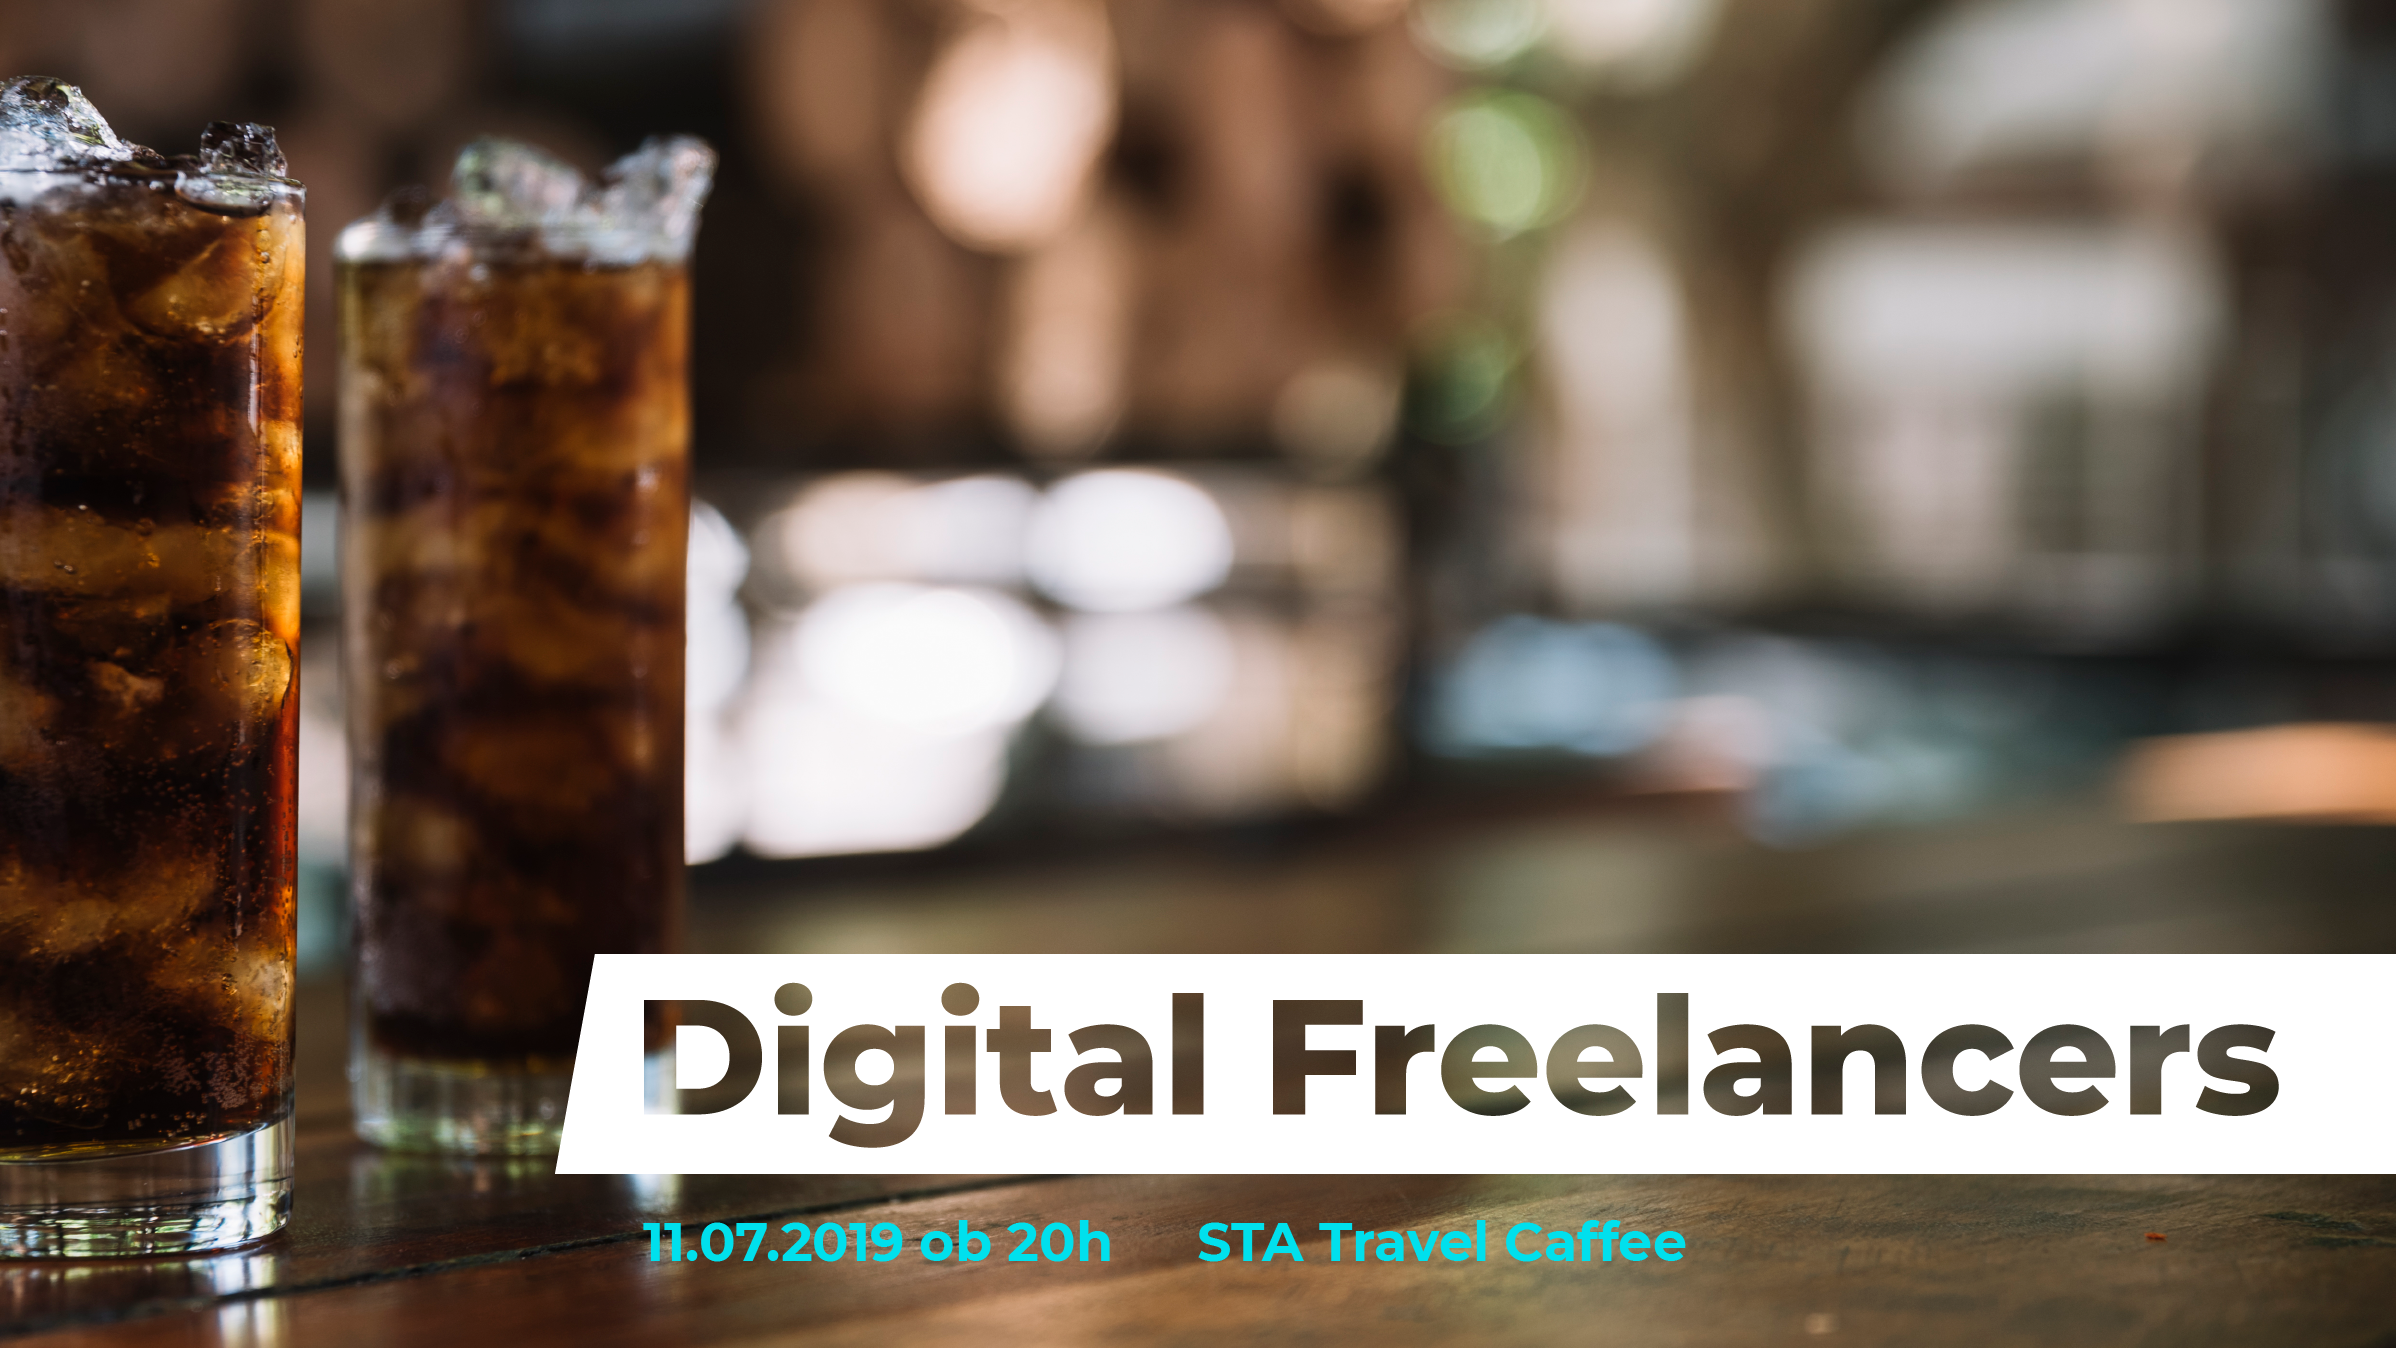 Digital Freelancers